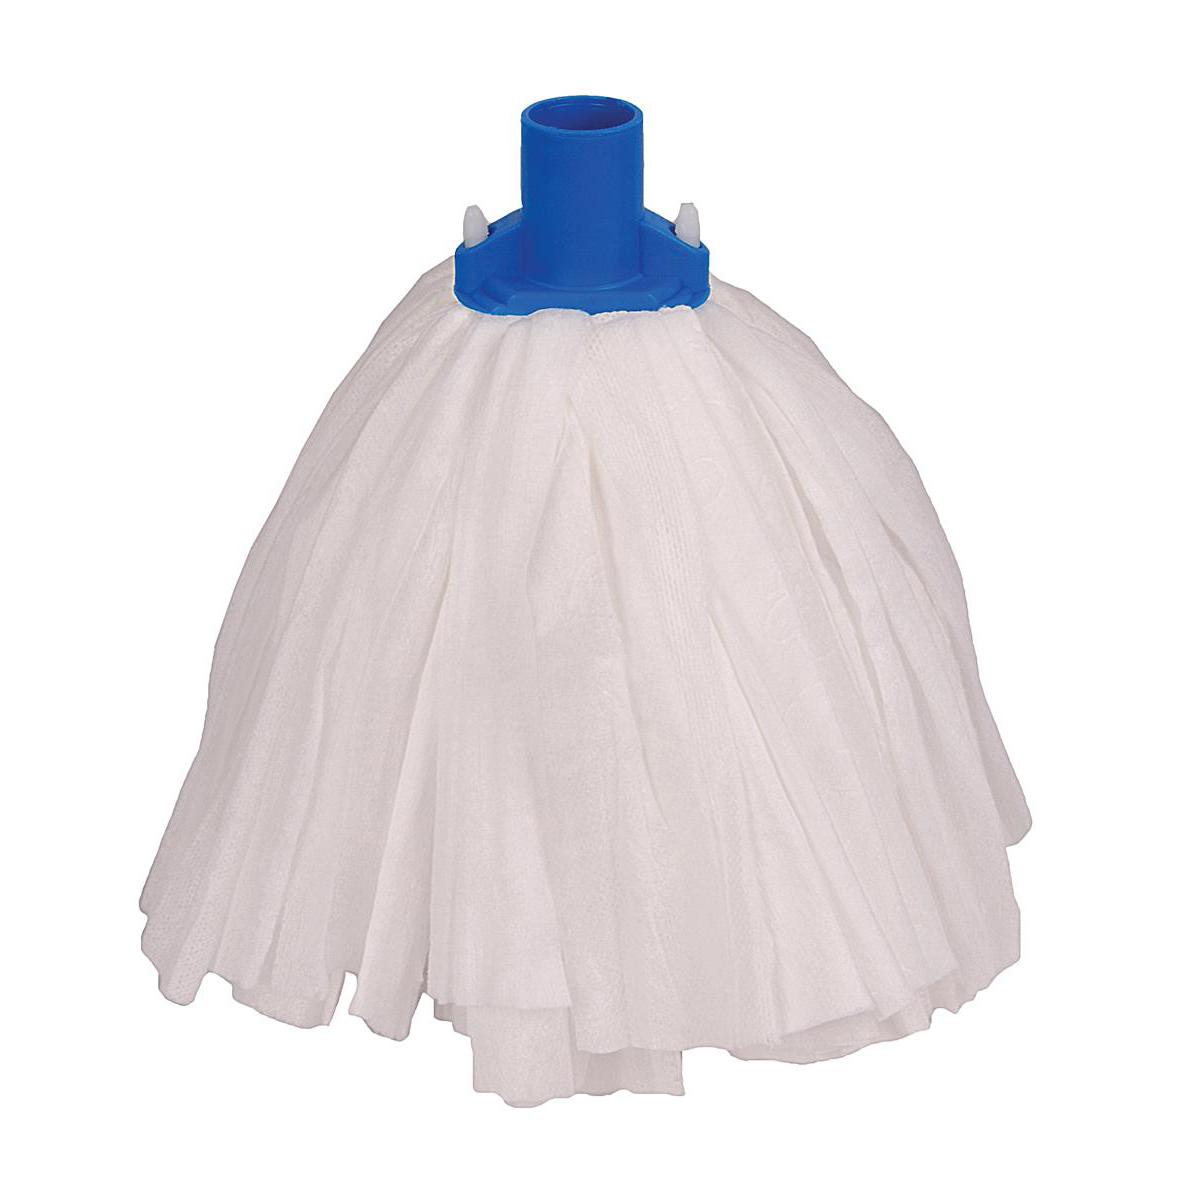 Robert Scott & Sons Big White Socket Mop T1 Non-woven Colour-coded Blue Ref 102211BLUE [Pack 10]